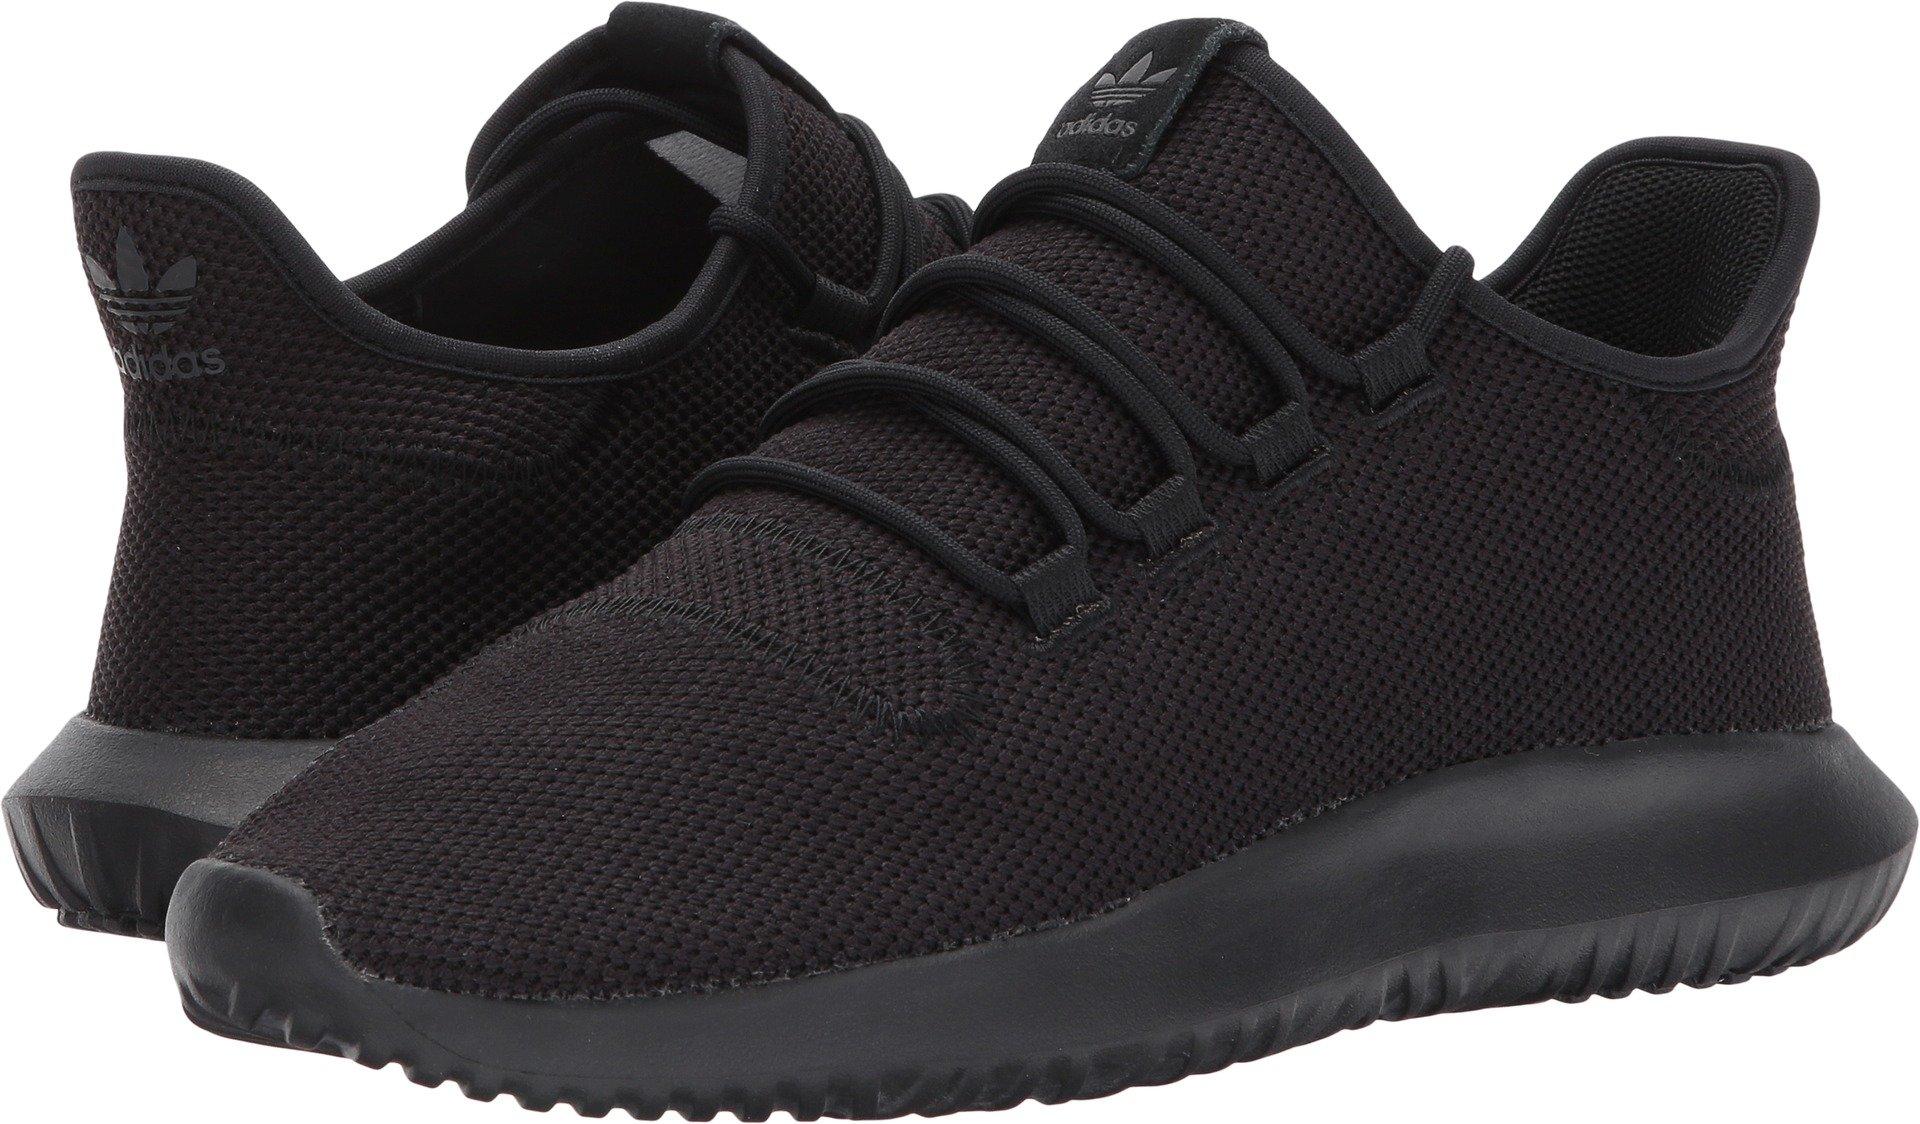 adidas Originals Men's Tubular Shadow Sneaker Running Shoe, White/Black, 9.5 D(M) US